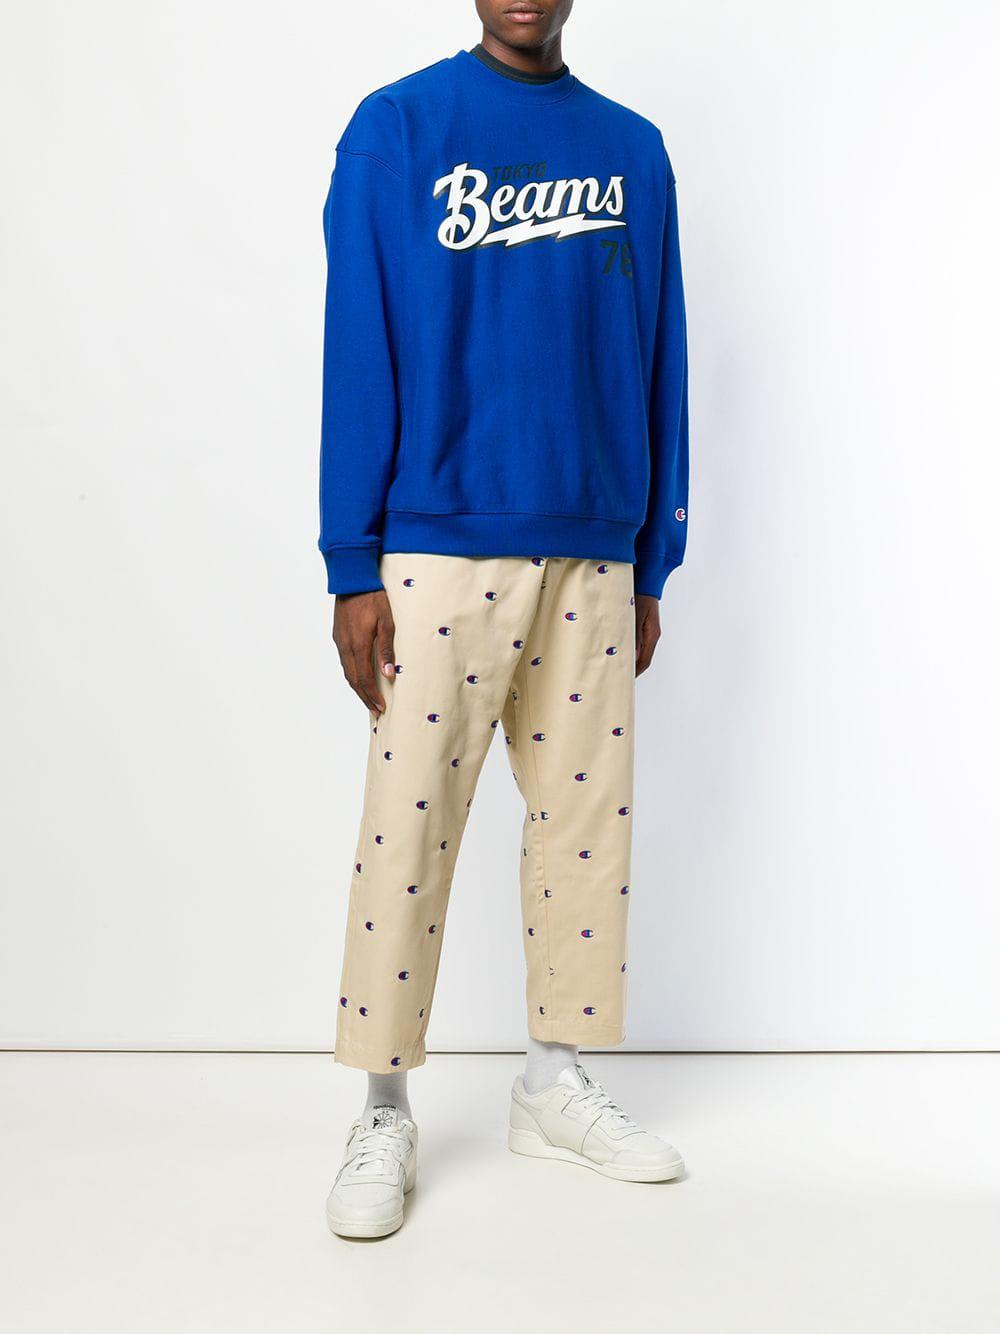 4ec9ca8b0123 Lyst - Champion X Tokyo Beams Crew Neck Sweatshirt in Blue for Men